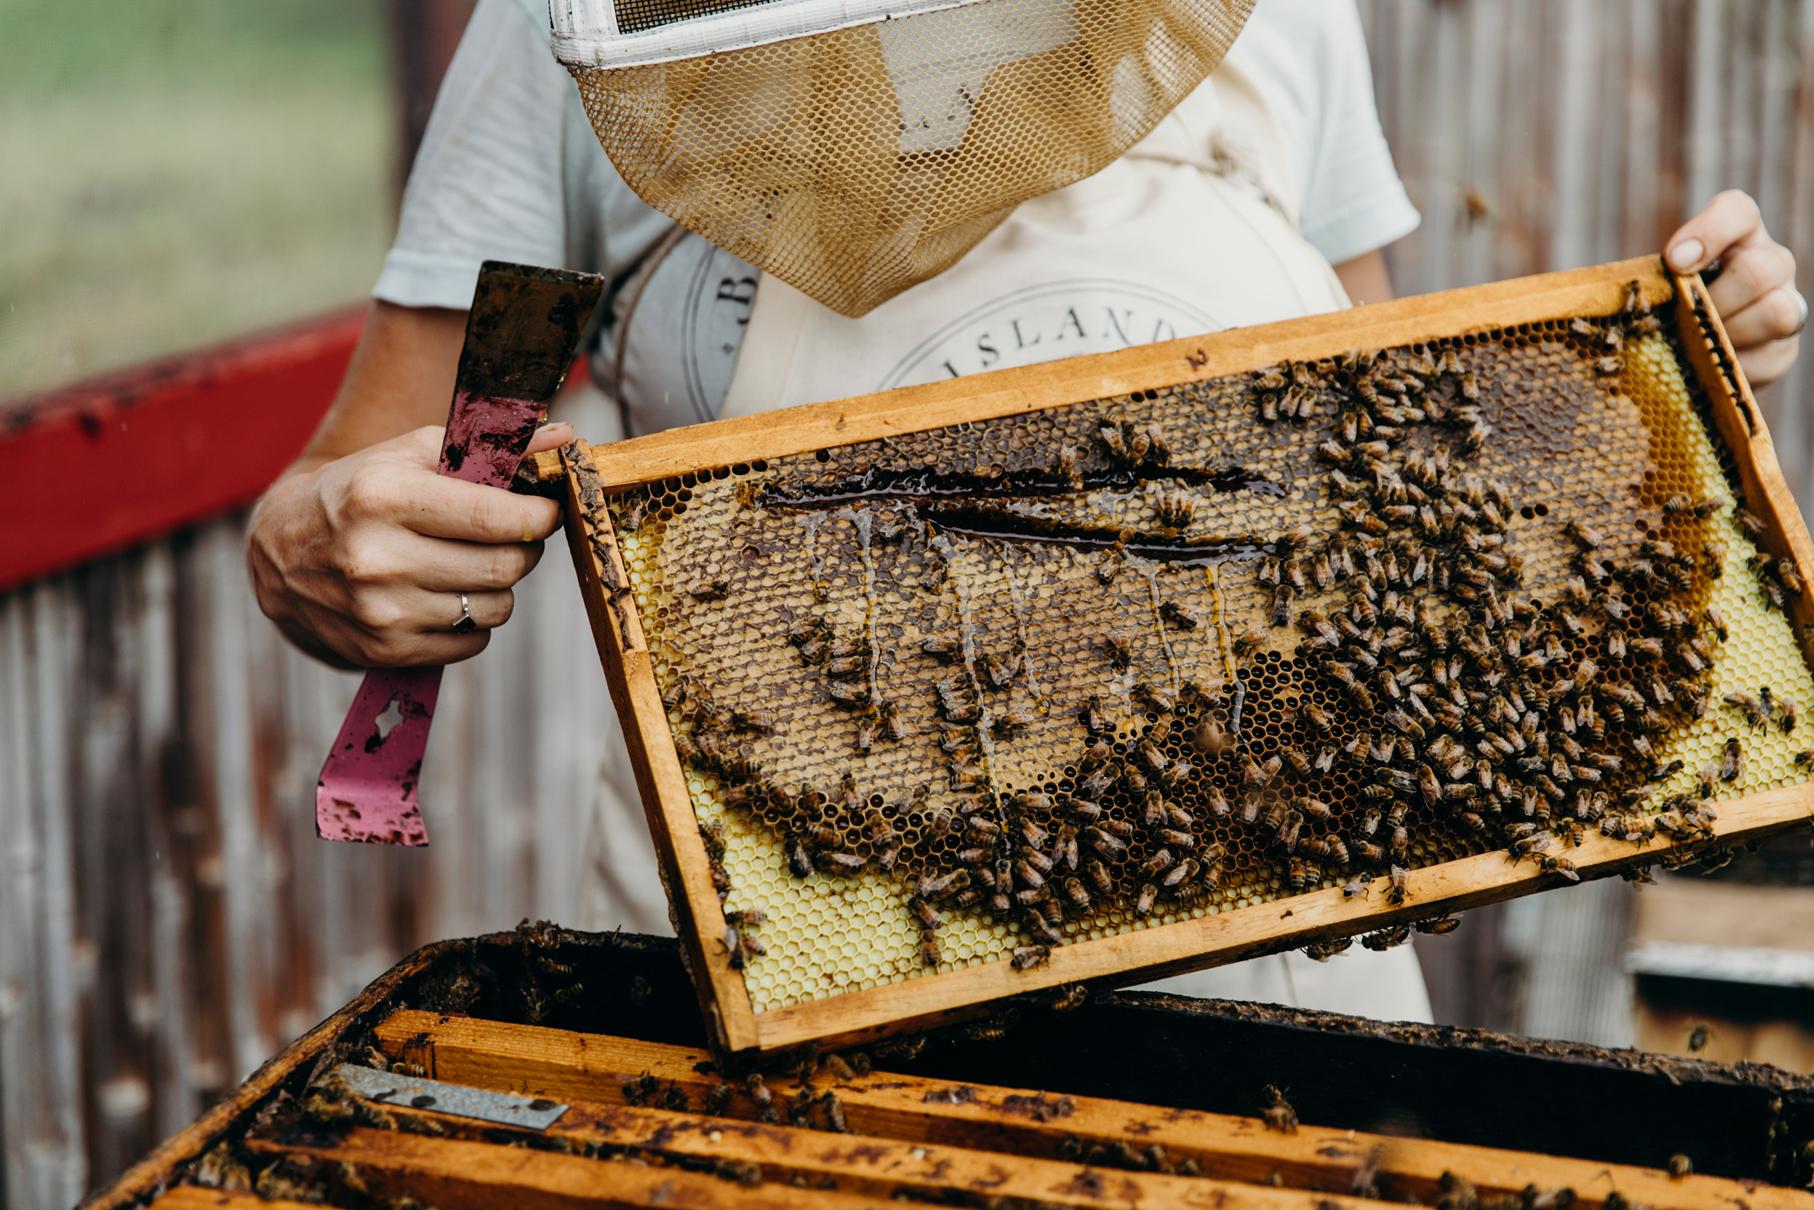 Local beekeeper shows honeycomb